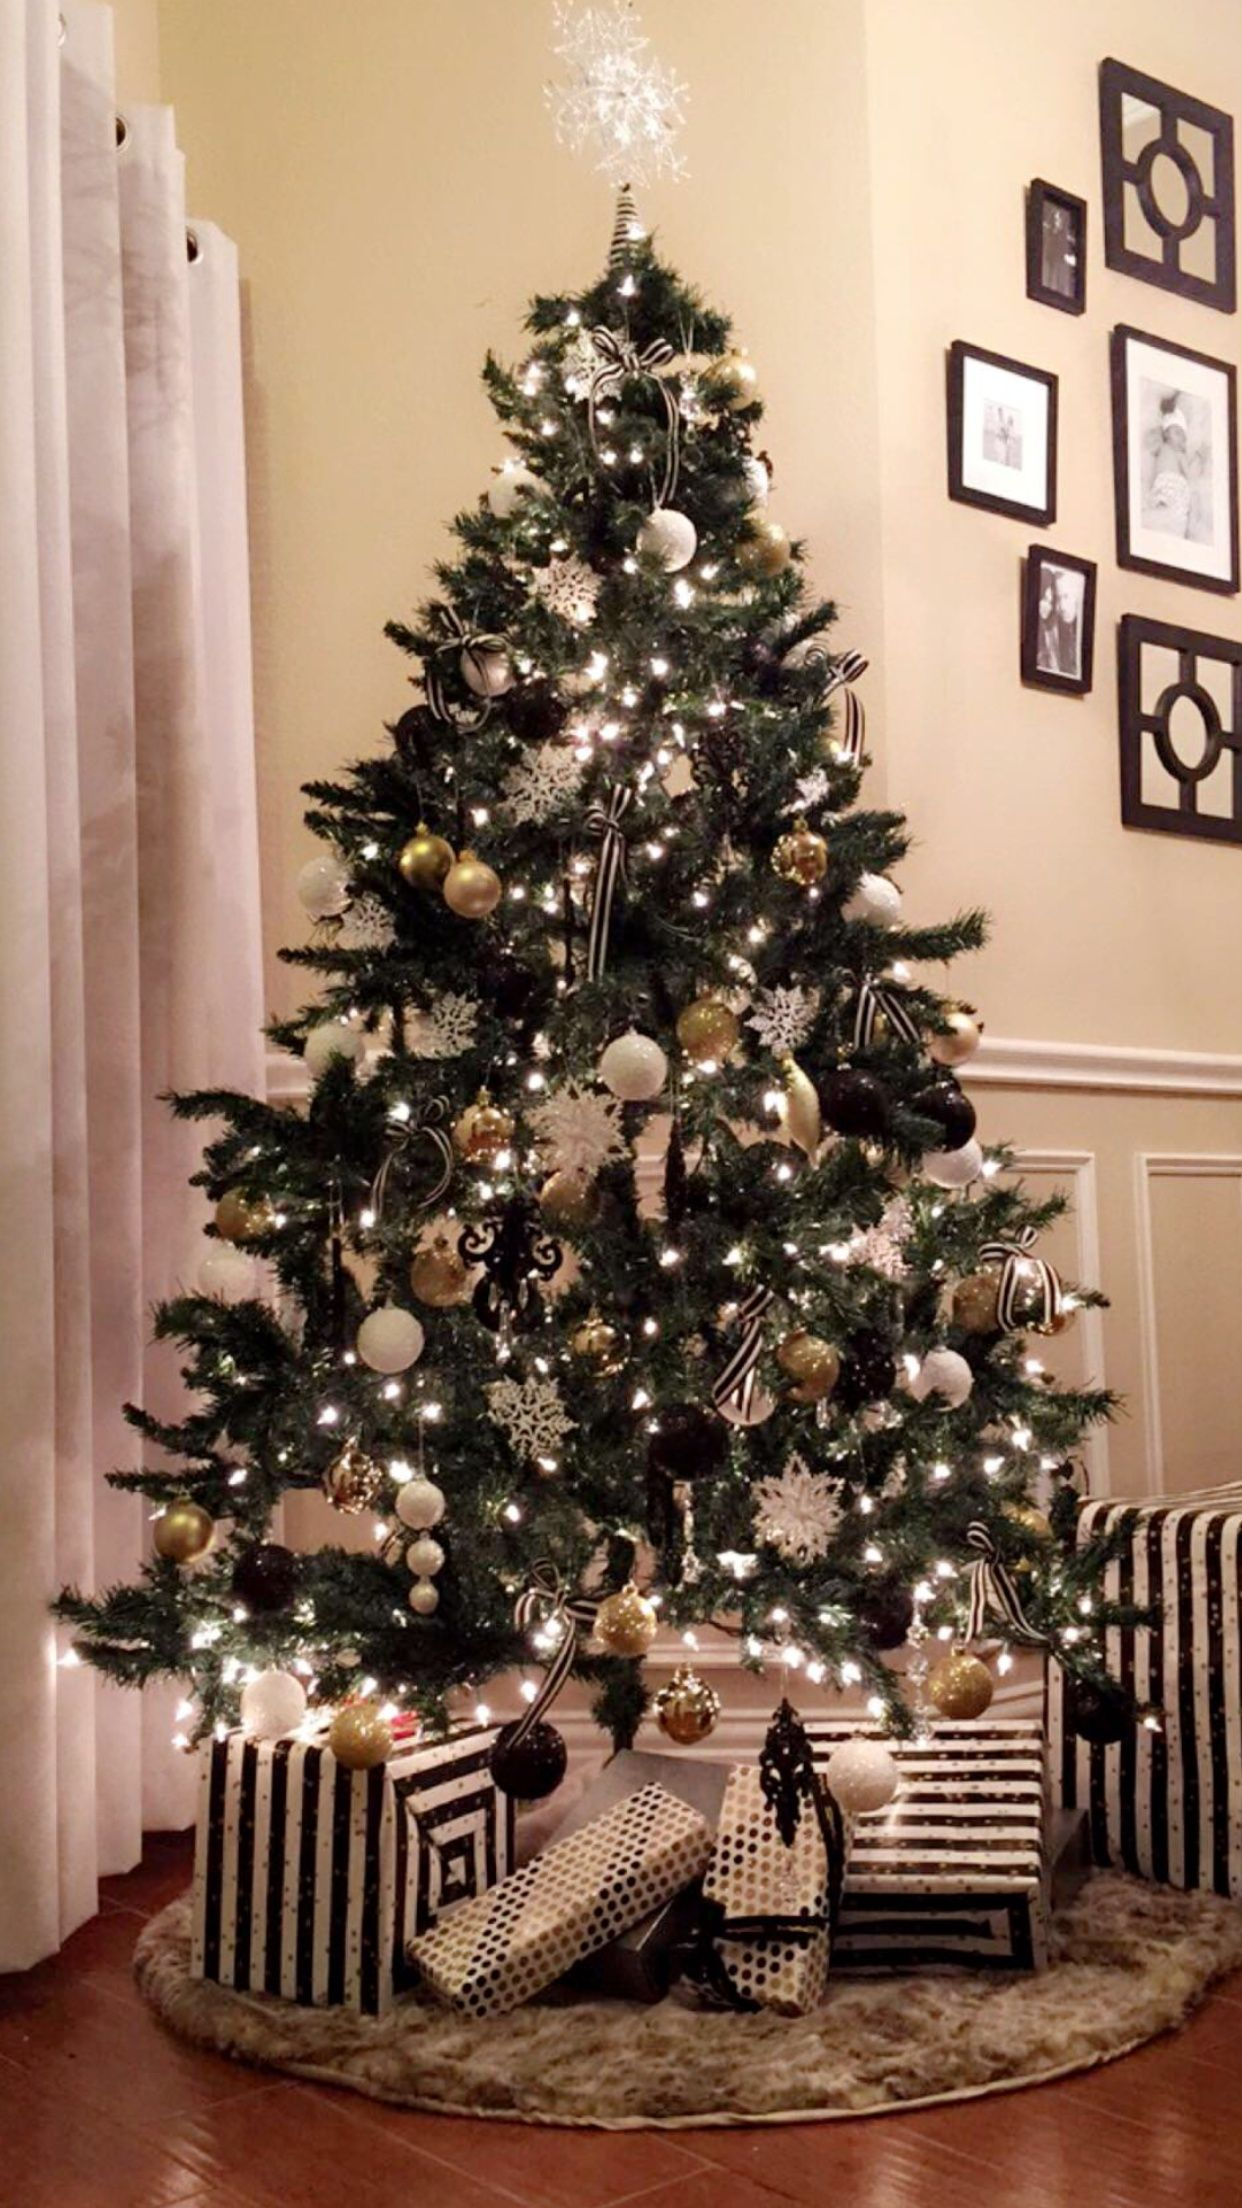 22+ Beautiful Black And Gold Christmas Decor Ideas #kerstboomversieringen2019